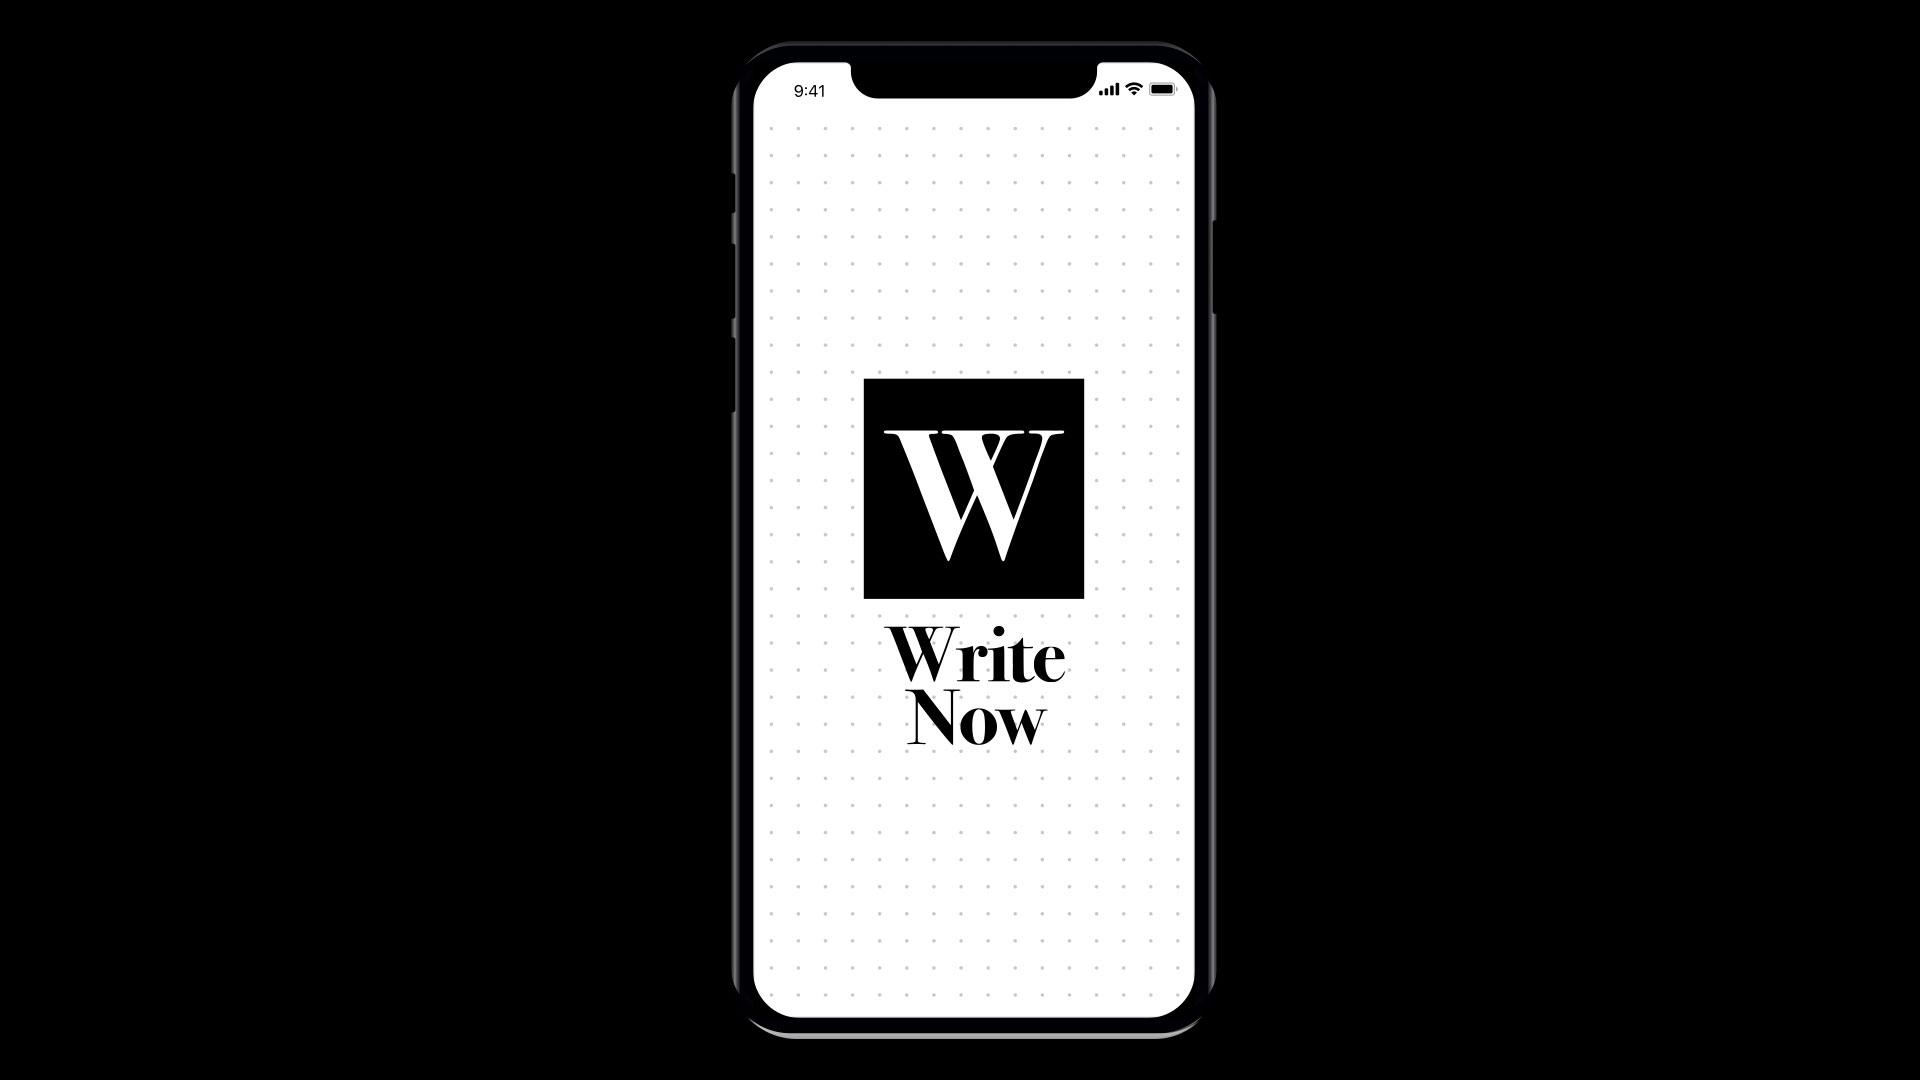 Lee_Writenow-logo.jpg